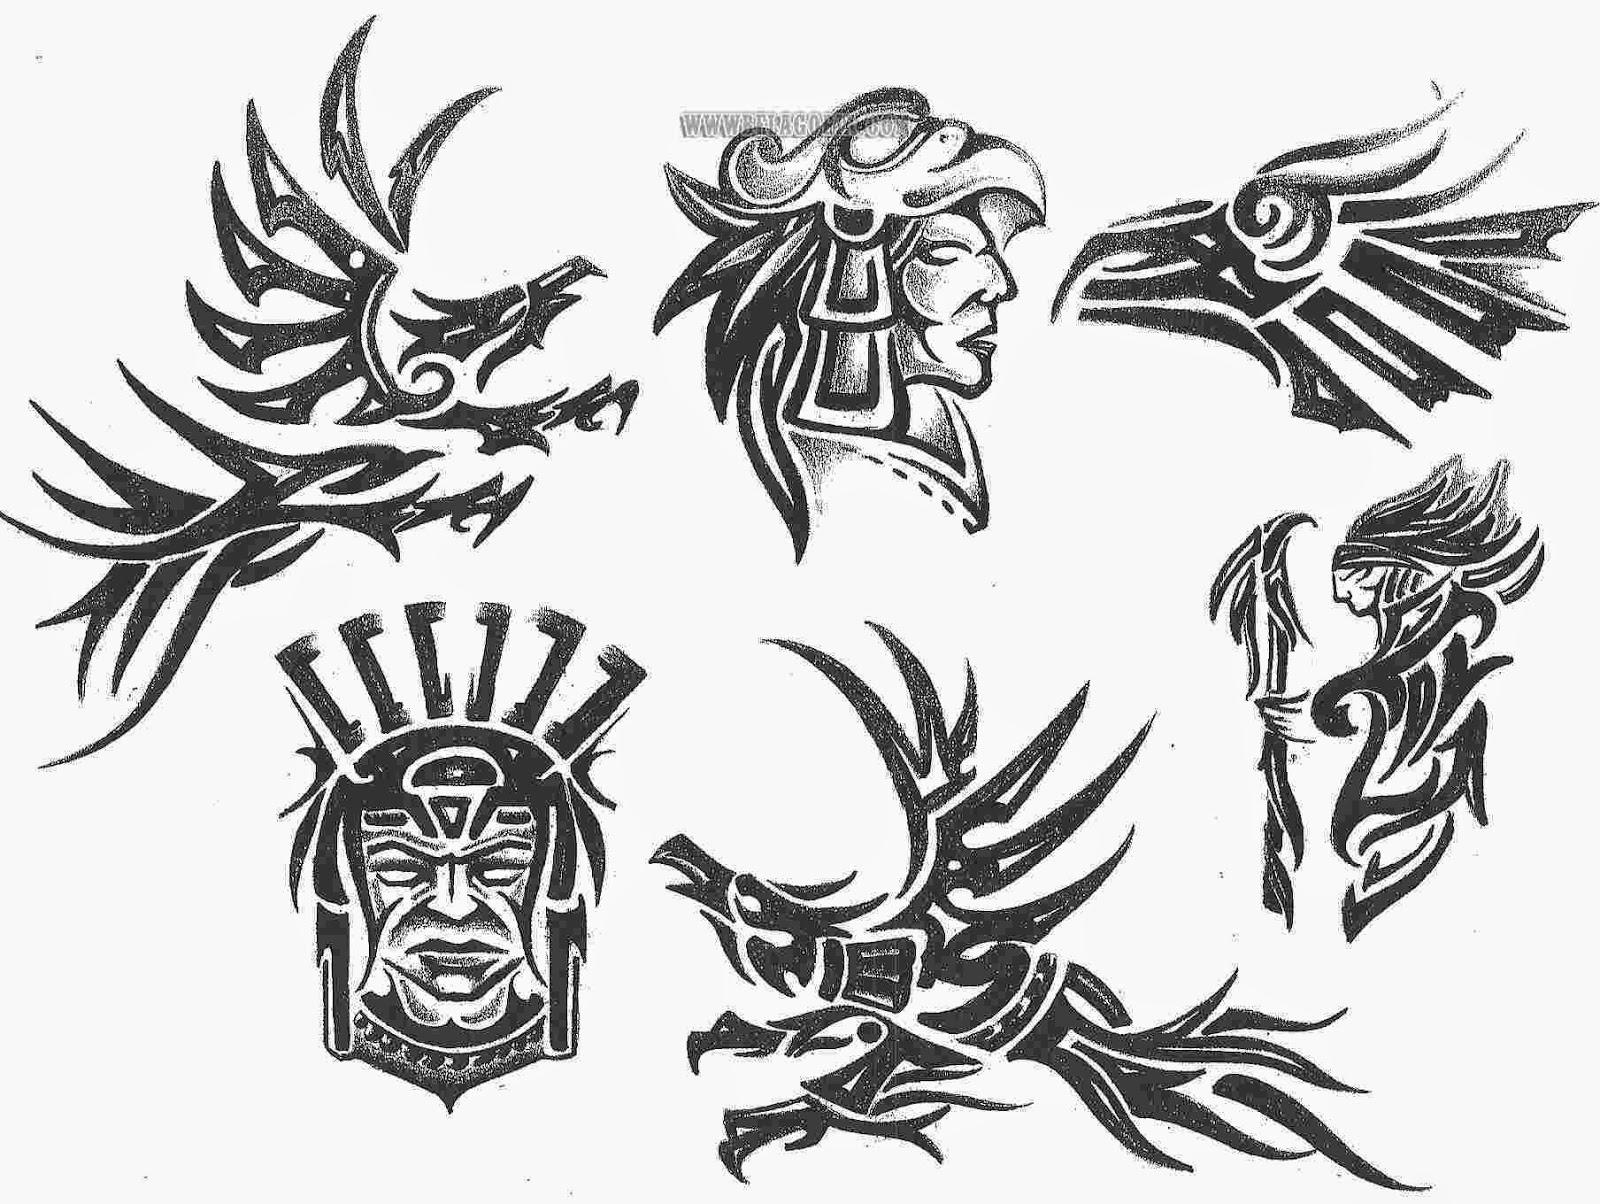 Disenos Aztecas Exclusivos 3